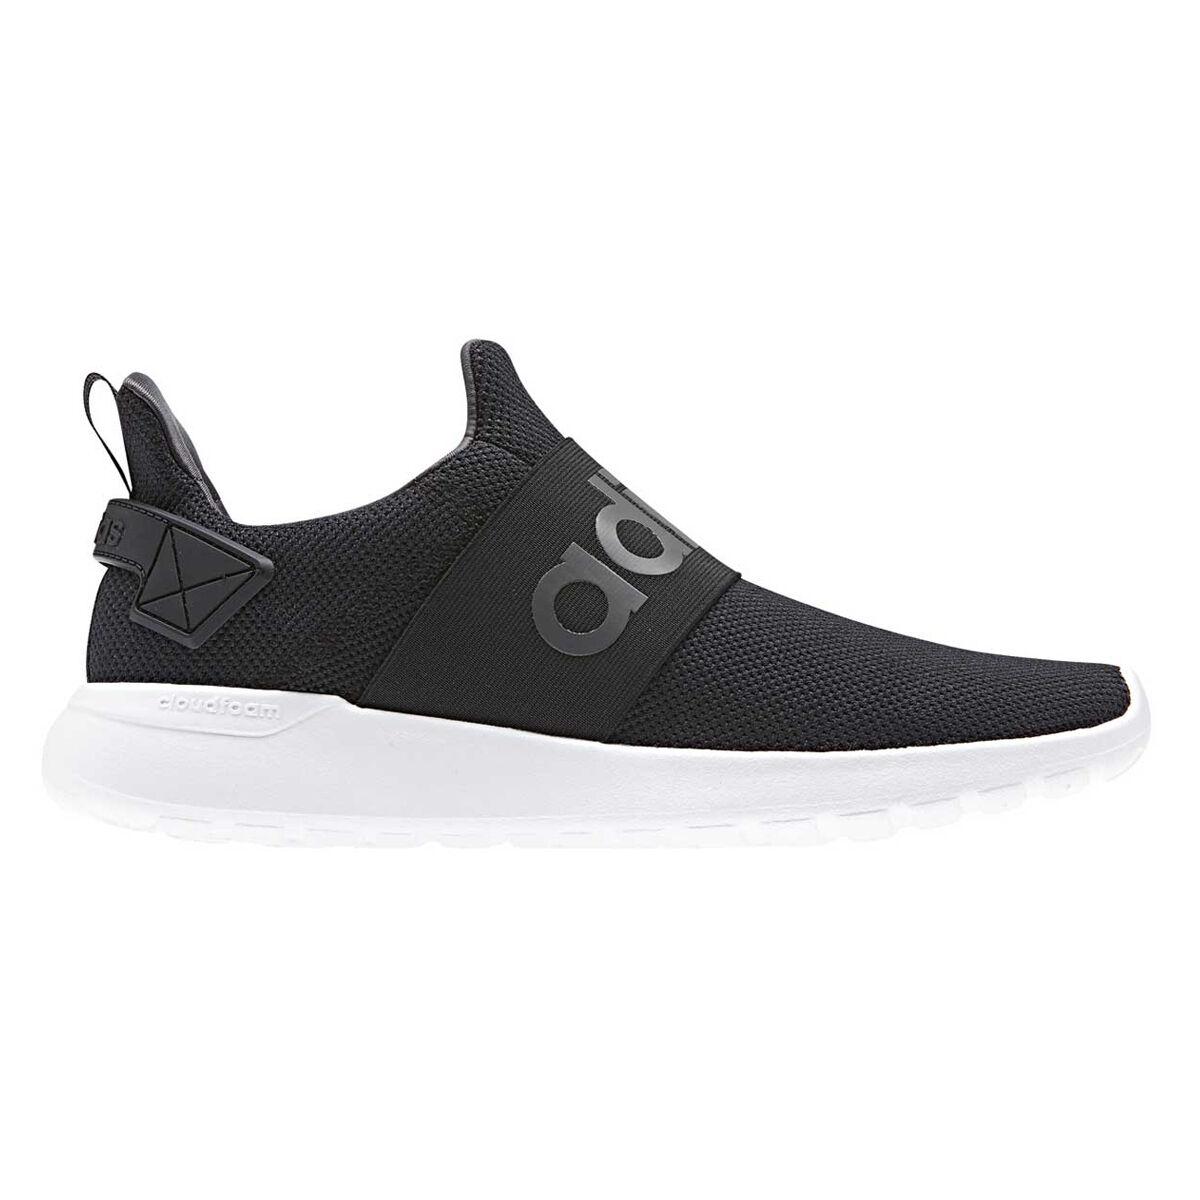 adidas cloudfoam lite racer adattare le scarpe casual nero / grigio noi uomini